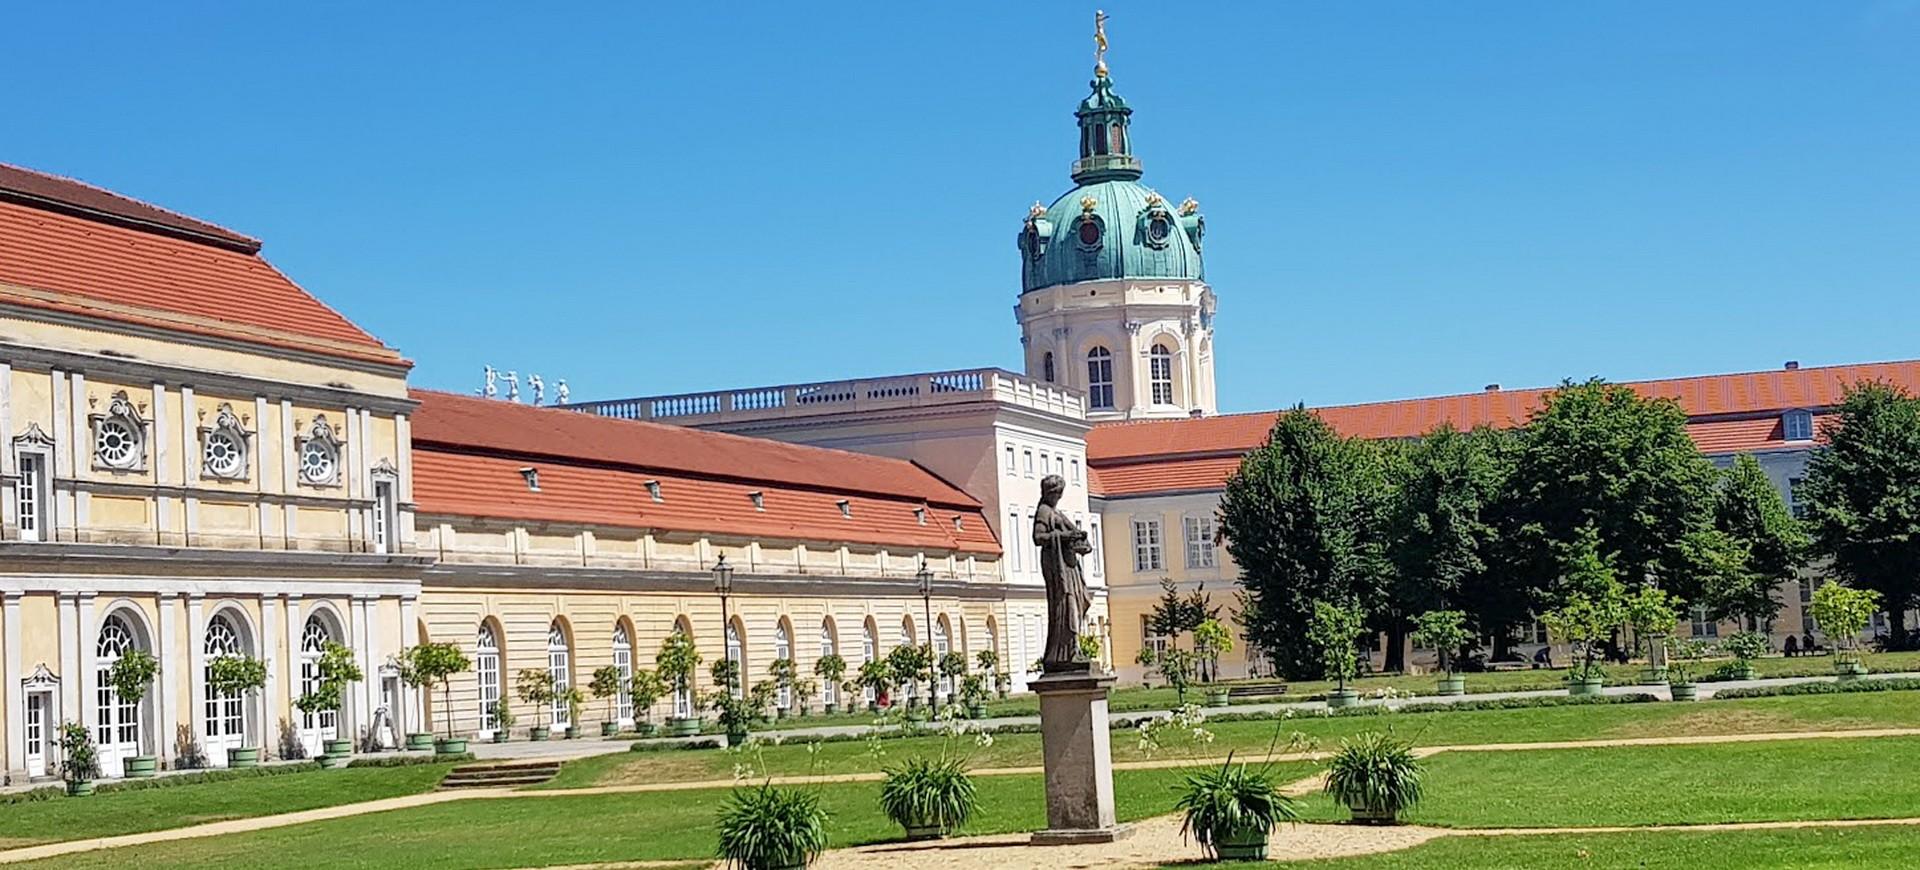 Allemagne Berlin Chateau Charlottenberg